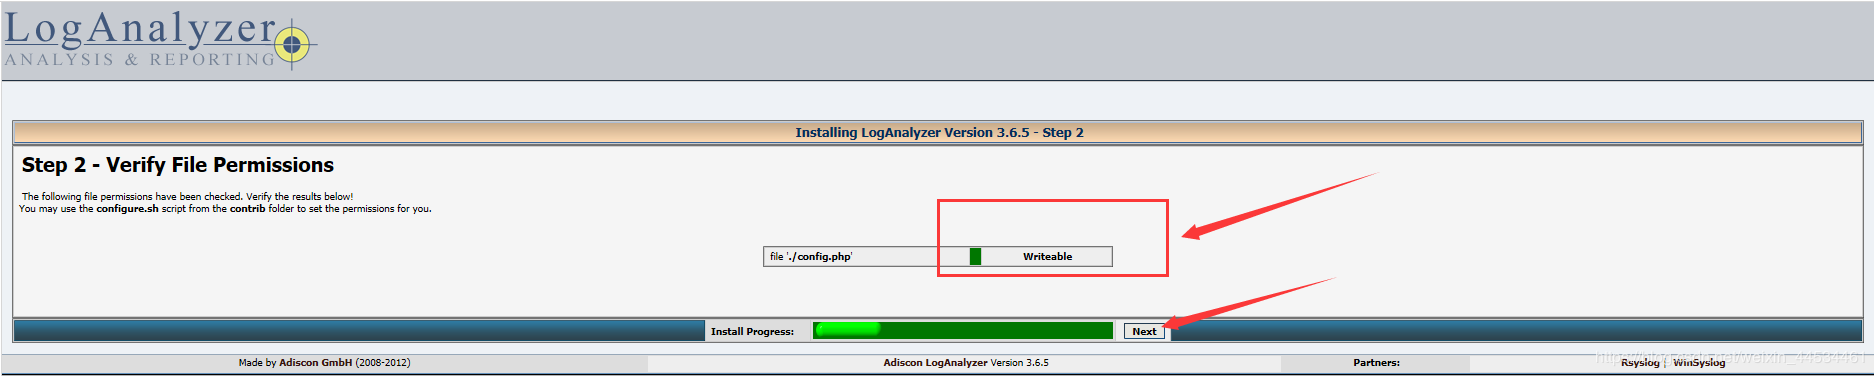 Centos7 build log server rsyslog+loganalyzer - Programmer Sought